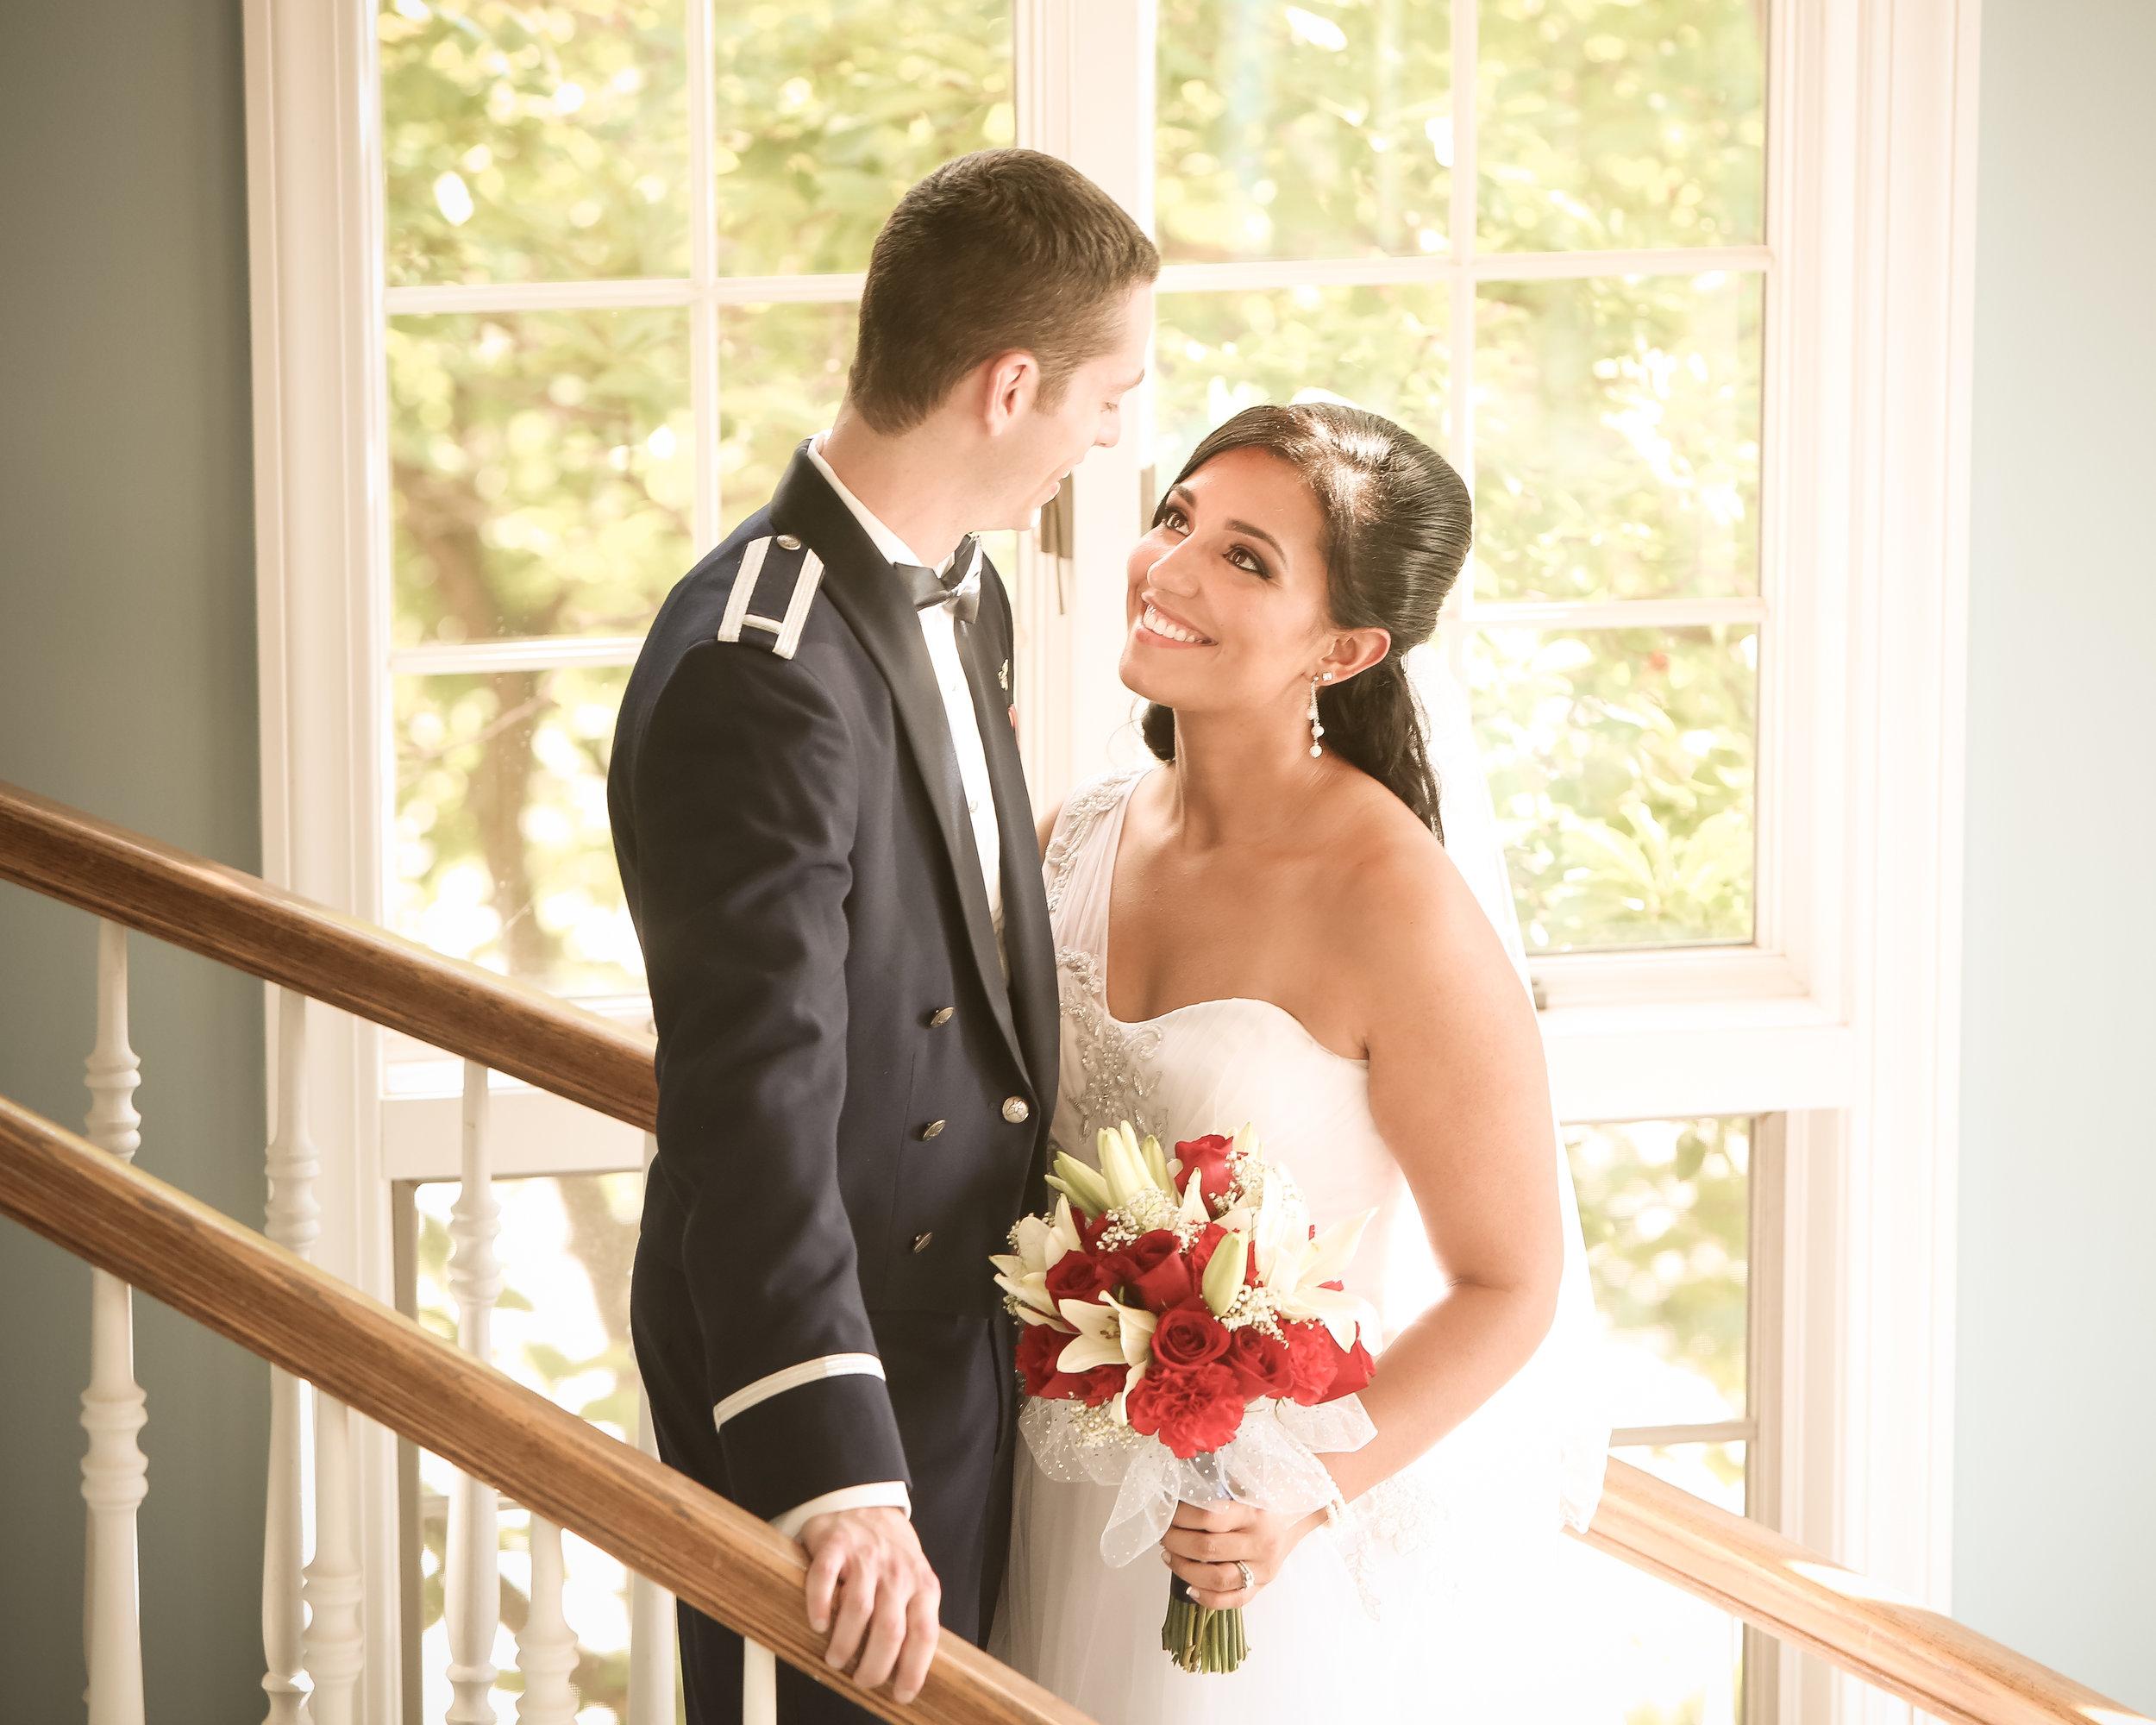 Marriage - stairs.jpg